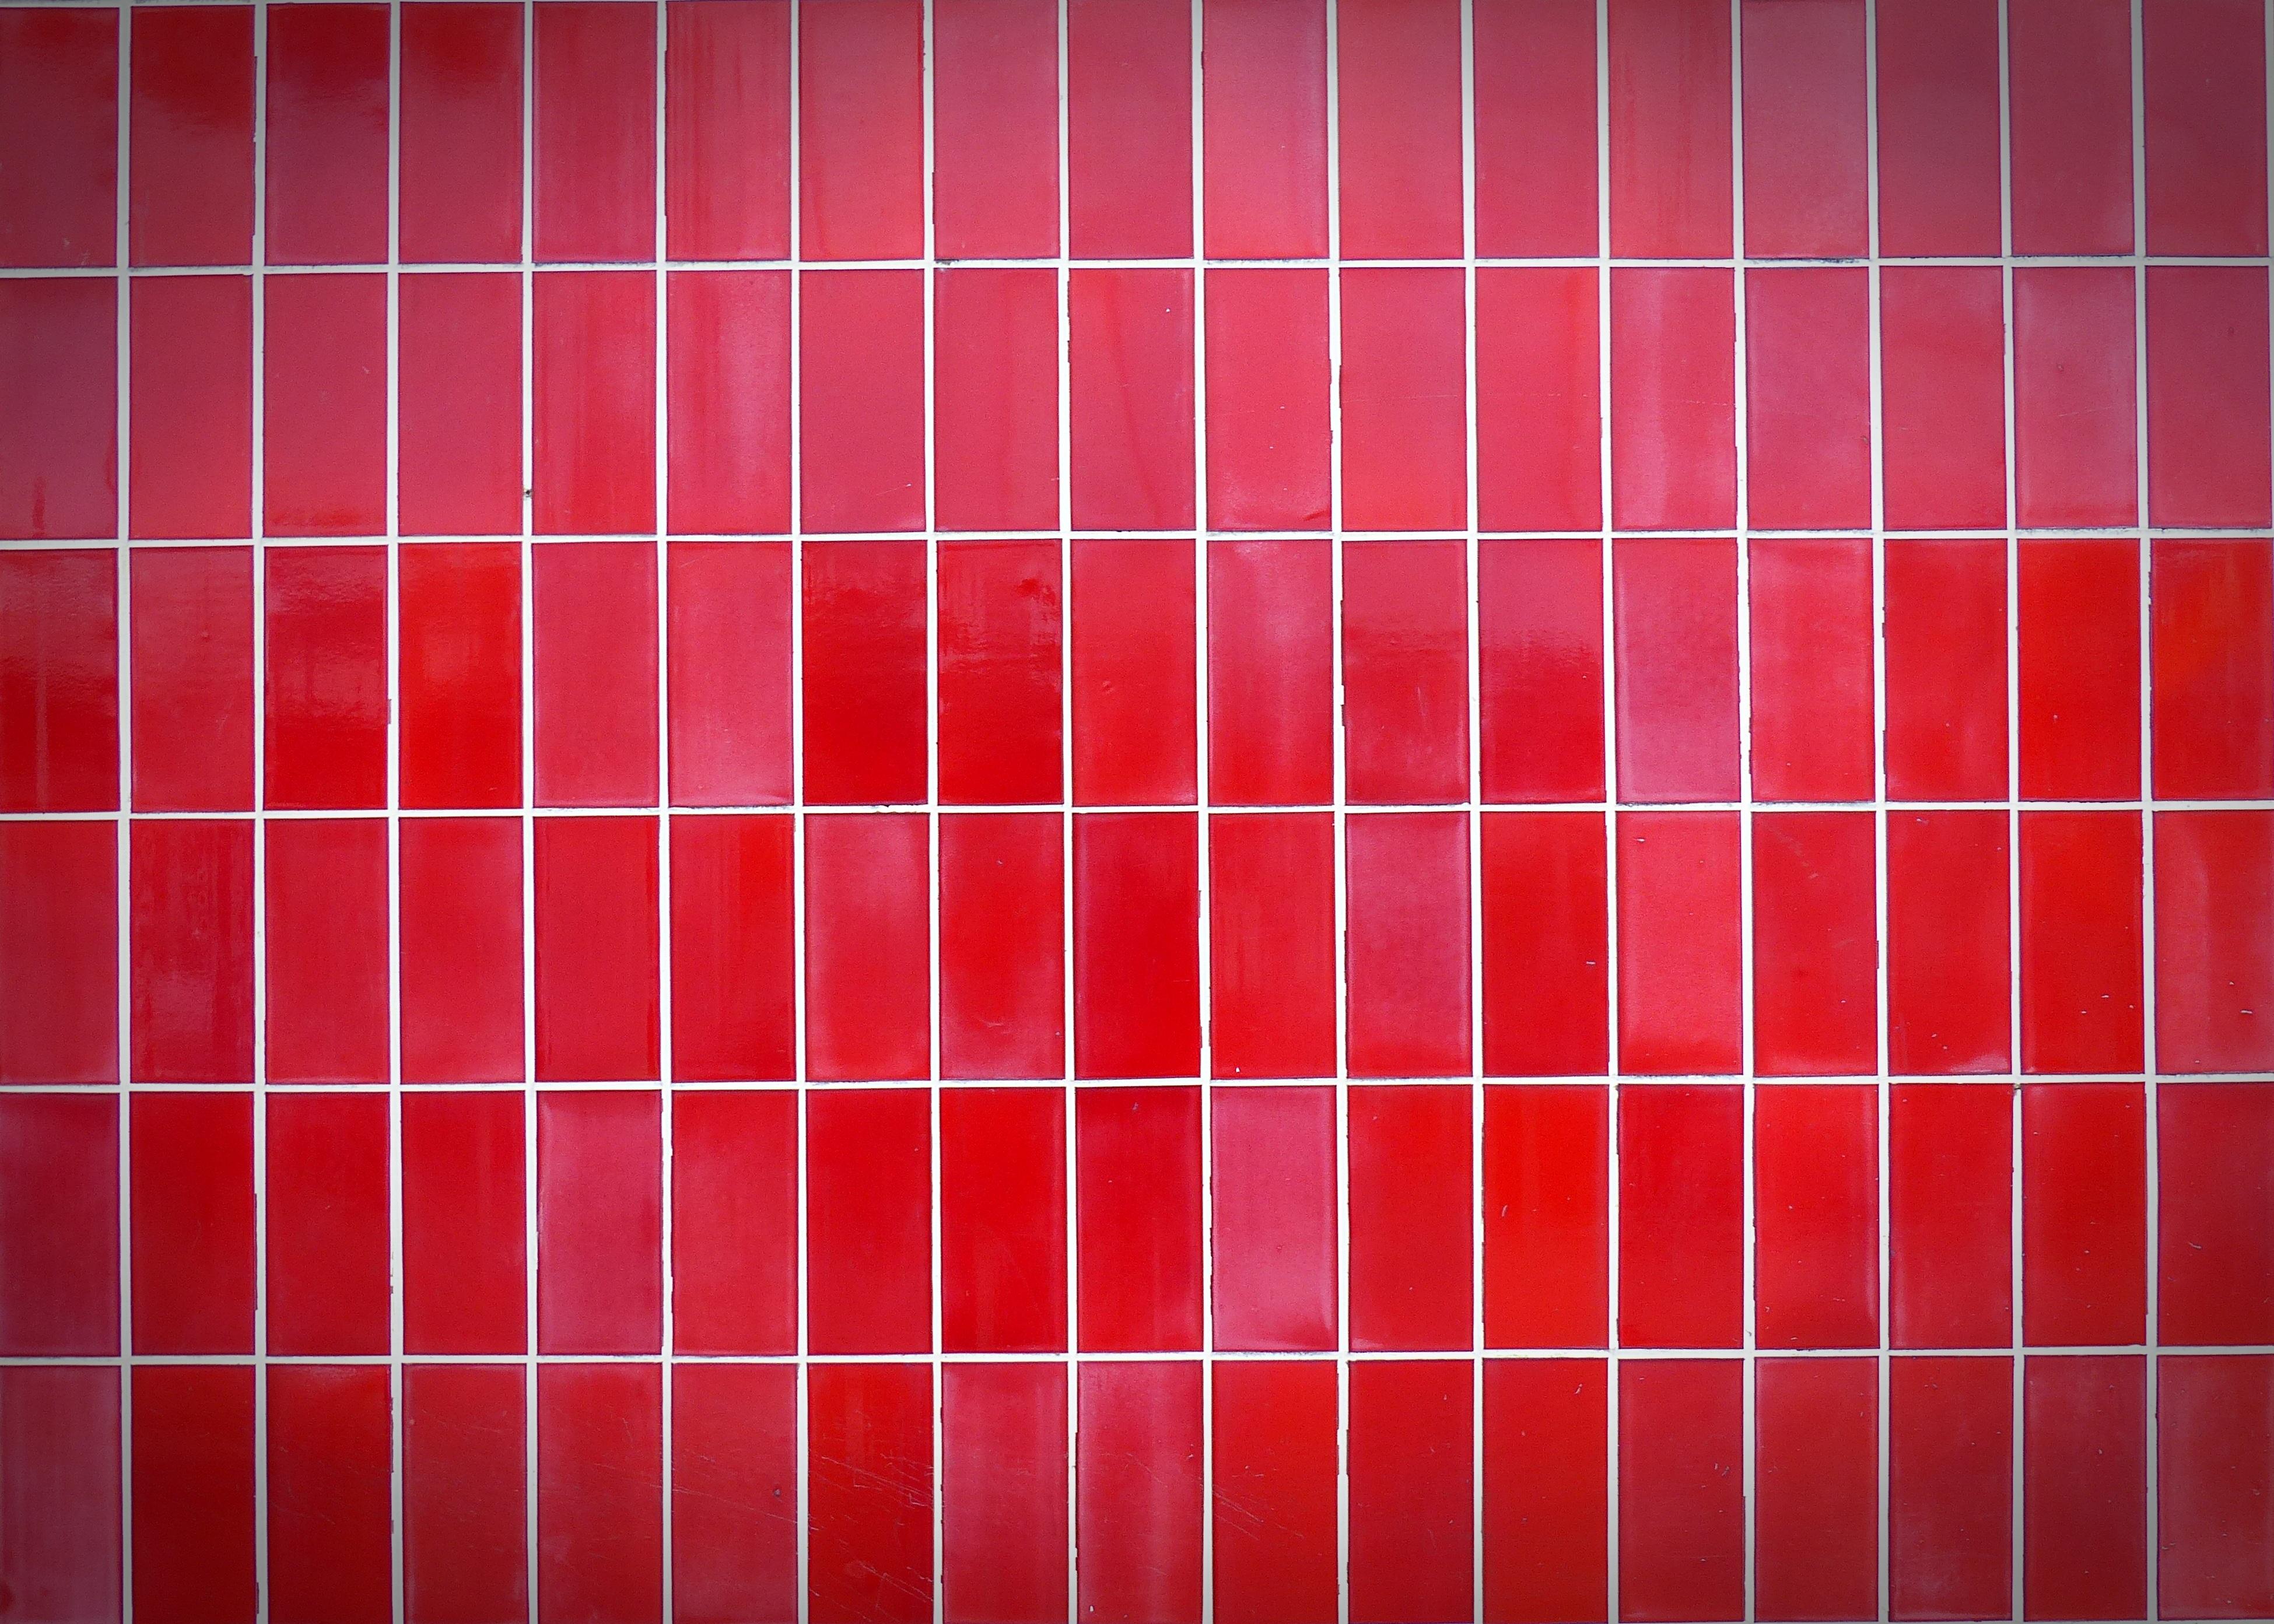 Fotos Gratis Estructura Textura Piso Pared Patr 243 N